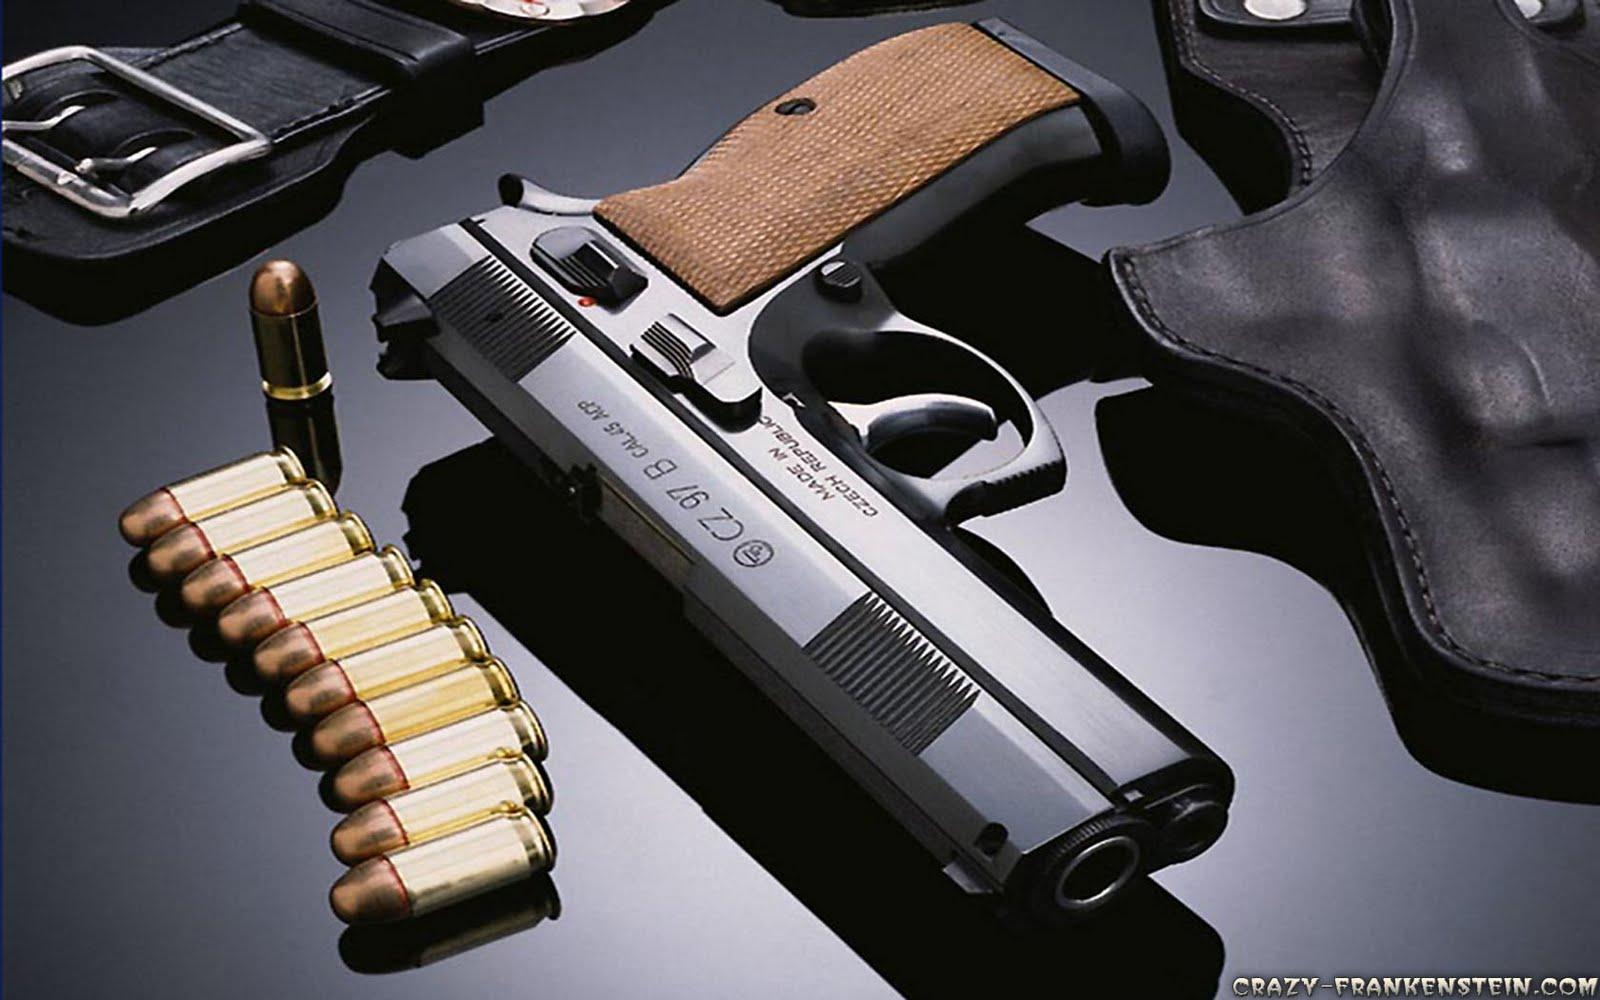 http://2.bp.blogspot.com/-_GZ2DO2uzTs/TnR_TSFyl8I/AAAAAAAABJc/00tmxYqjImA/s1600/Gun-Wallpapers-5.jpg